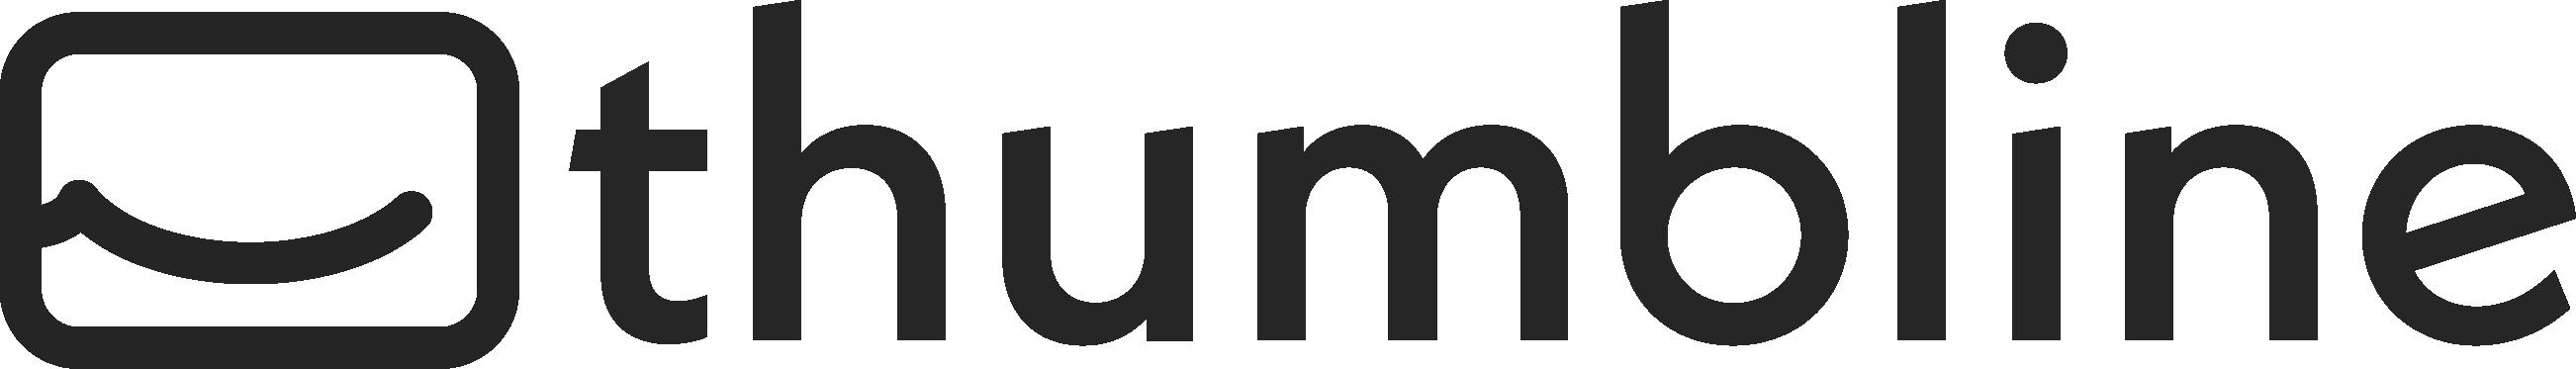 Thumbline logo   no buffer